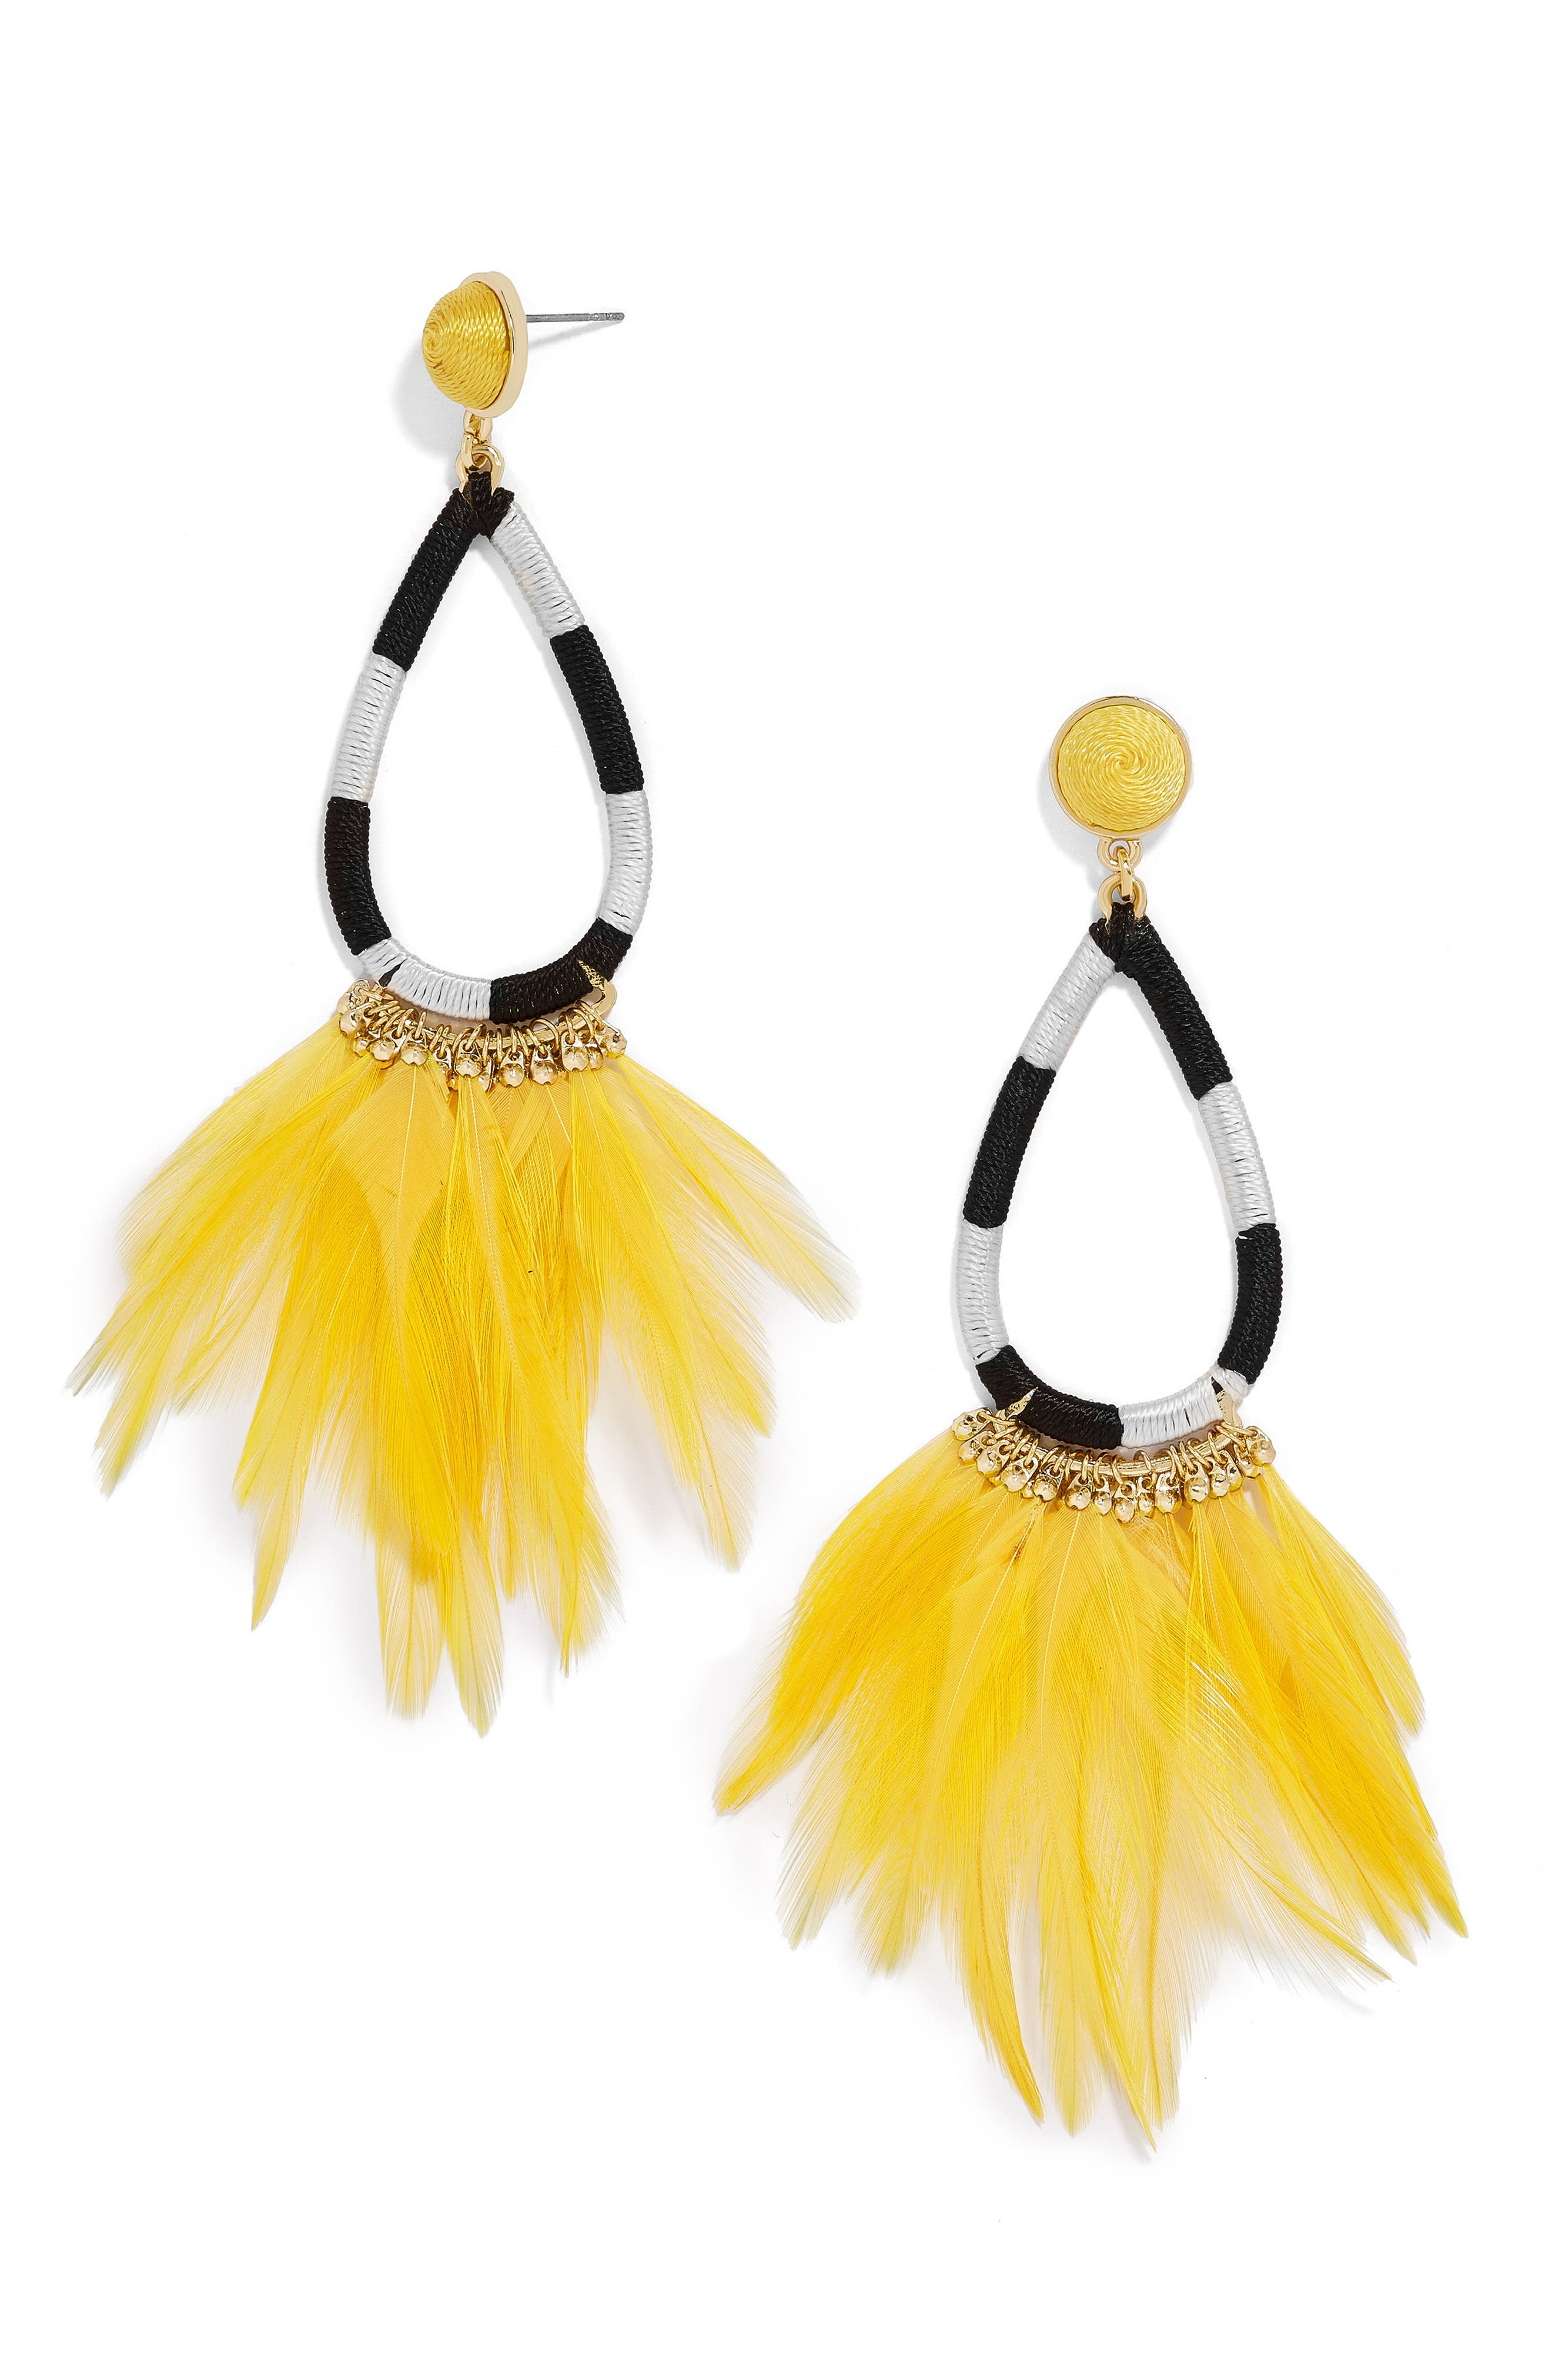 Main Image - BaubleBar Marigold Feather Shoulder Duster Earrings